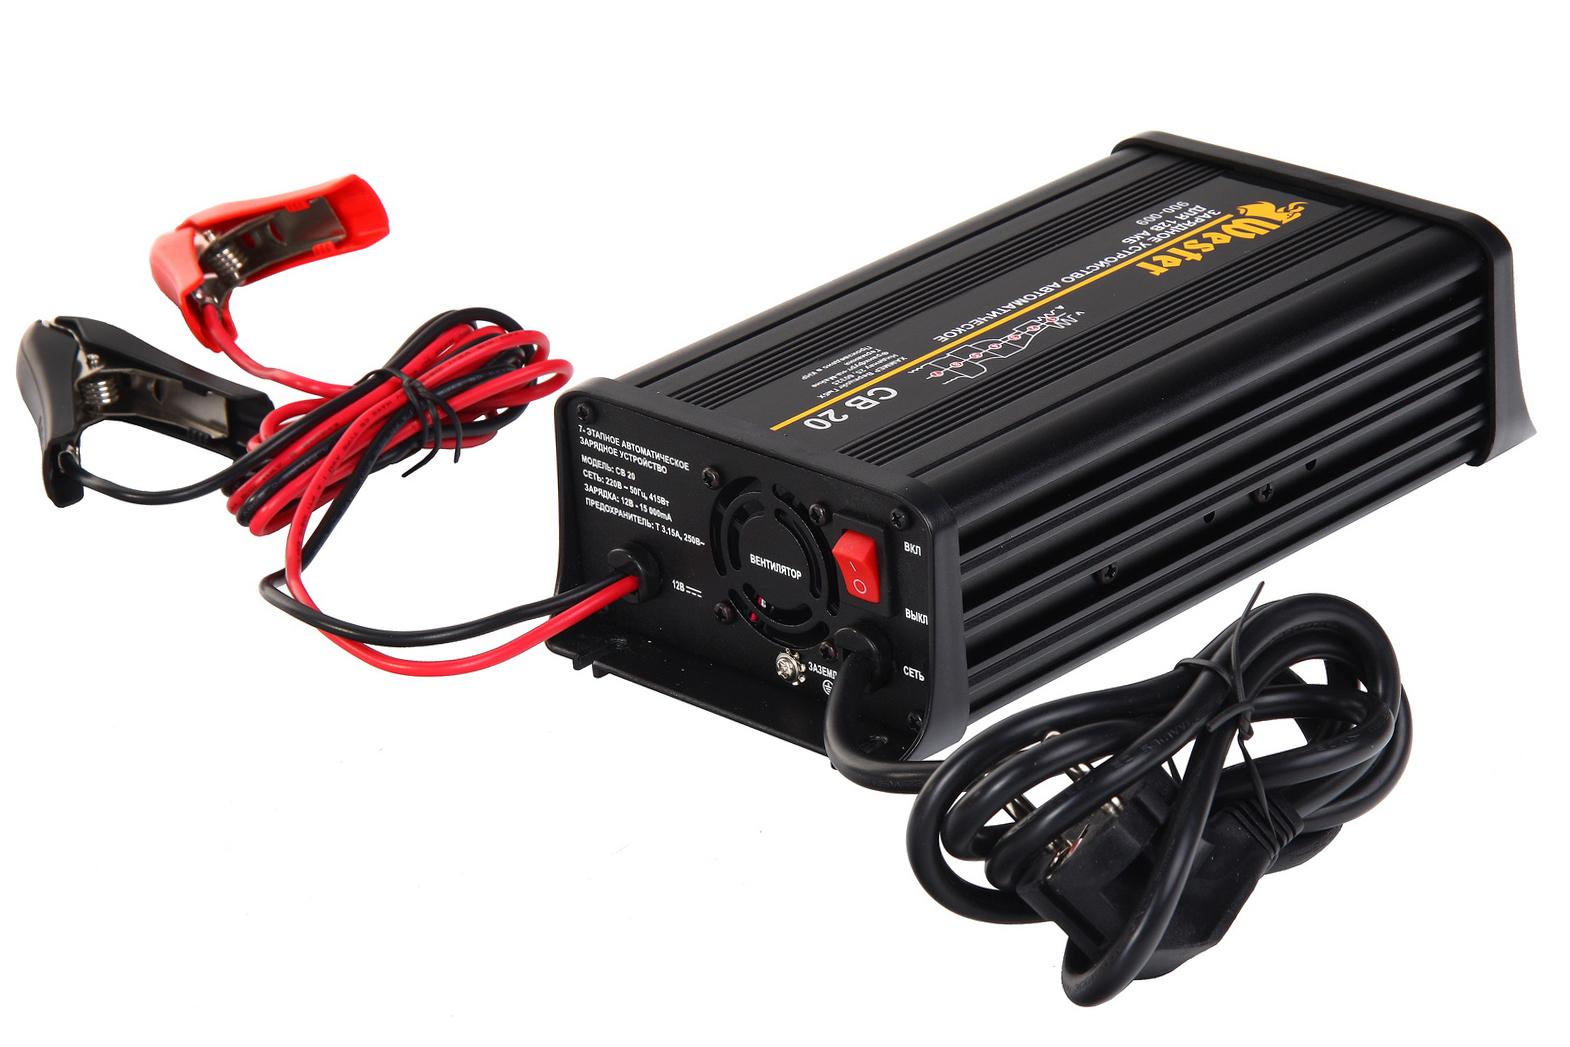 Устройство зарядное Wester Сb20 устройство зарядное wester ch20